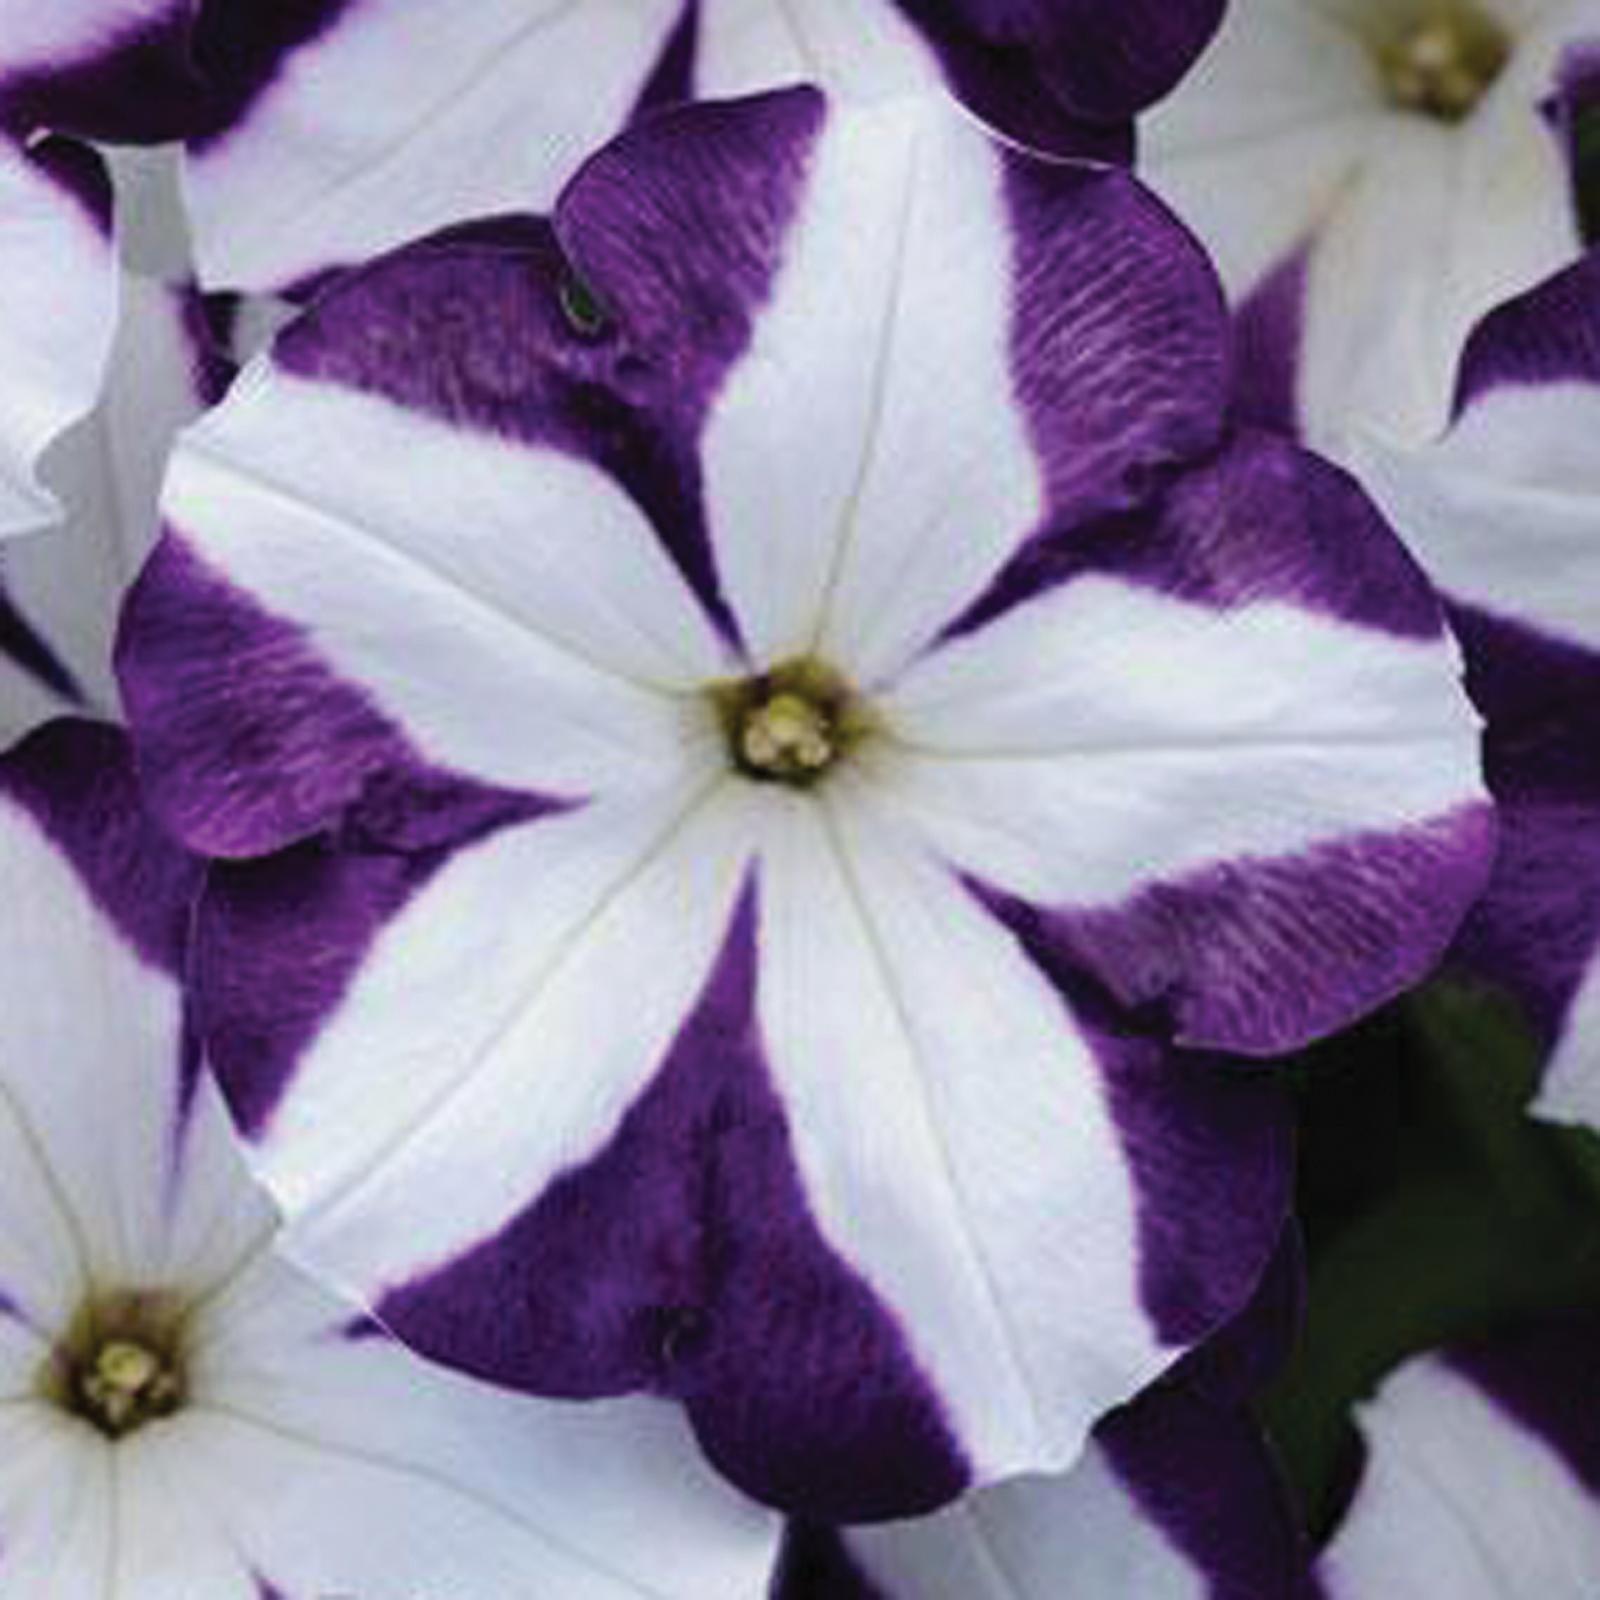 Variegated Petunia Purple And White Petunias Petunia Plant Flower Seeds